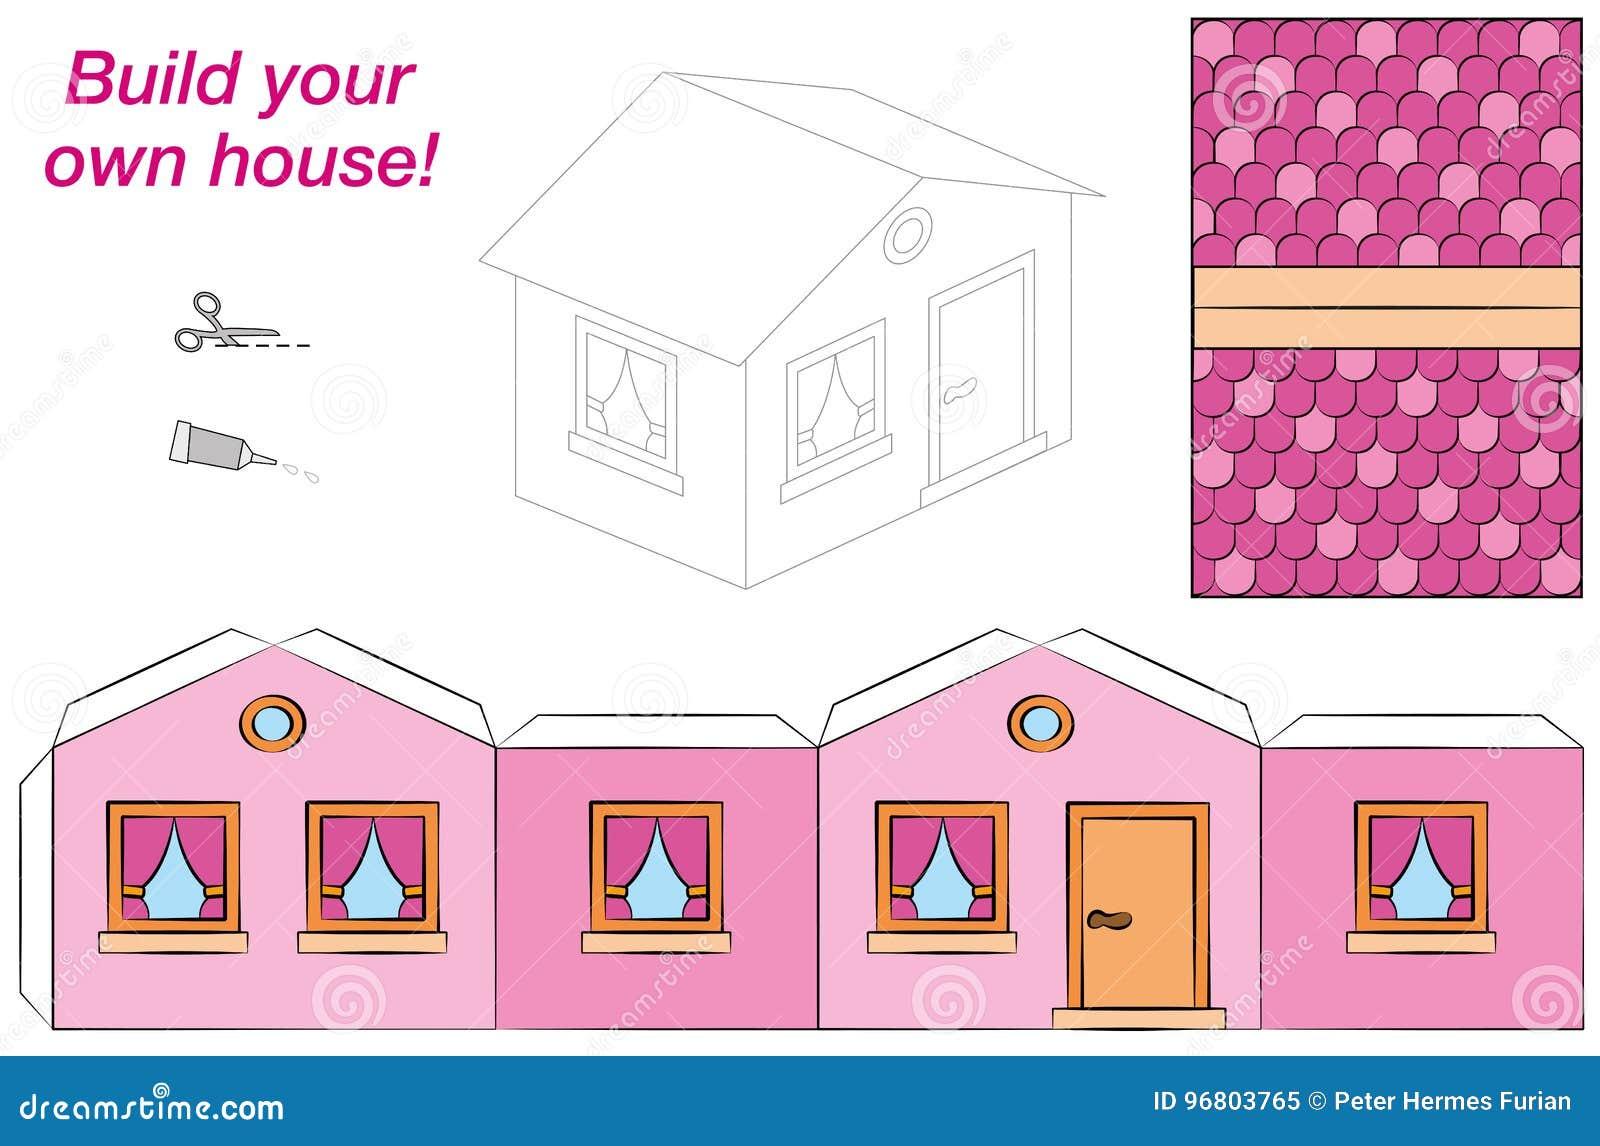 Haus Schablonen Papier Modell Pink Vektor Abbildung Illustration